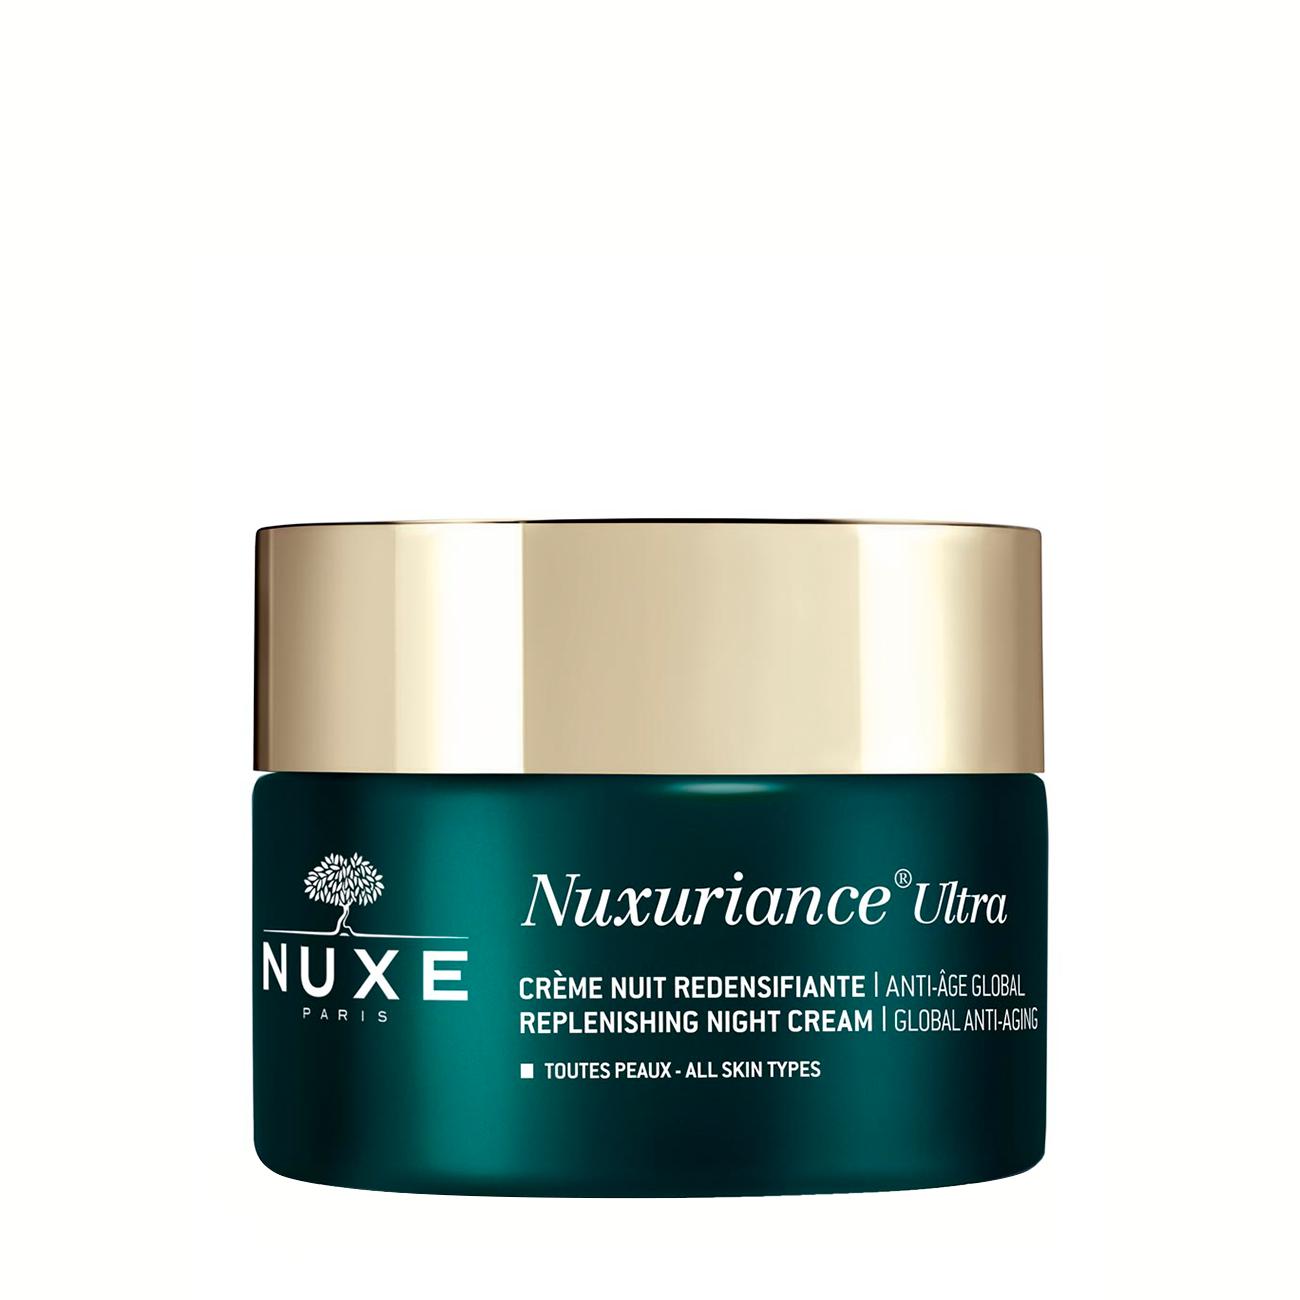 Nuxuriance Ultra - Replenishing Night Cream Global Anti-Aging 50ml Nuxe imagine 2021 bestvalue.eu